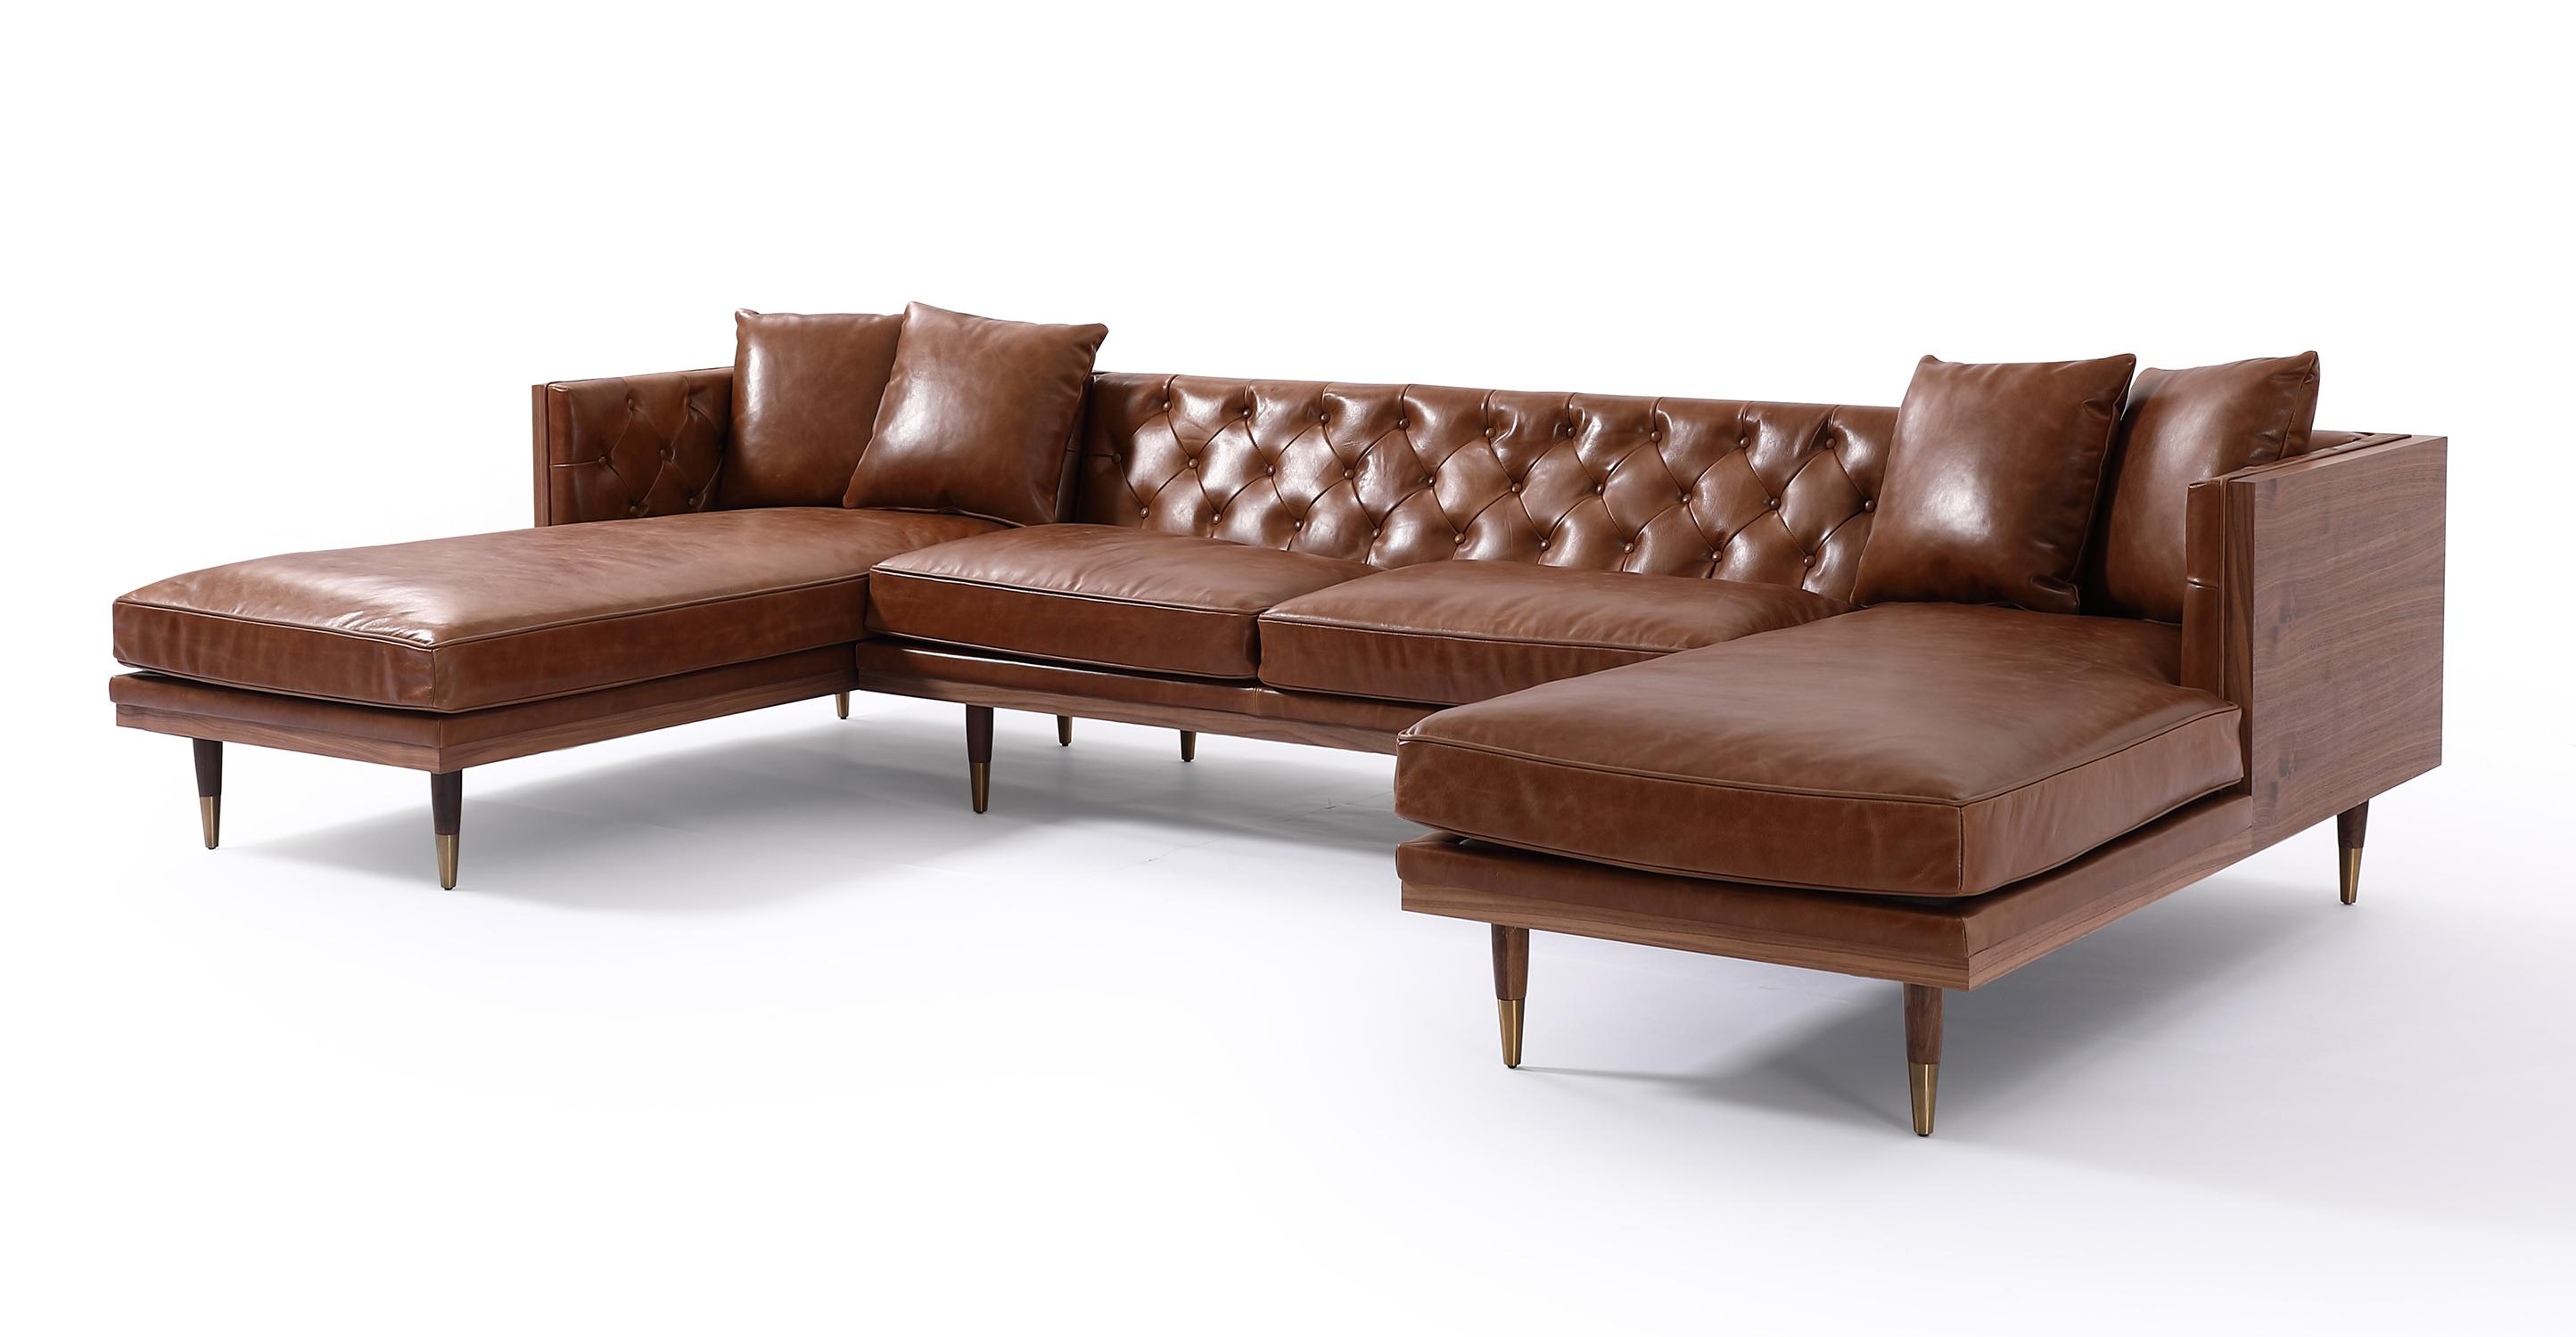 "Woodrow Neo 126"" Leather Sofa U-Sectional, Walnut/Saddle Brown"